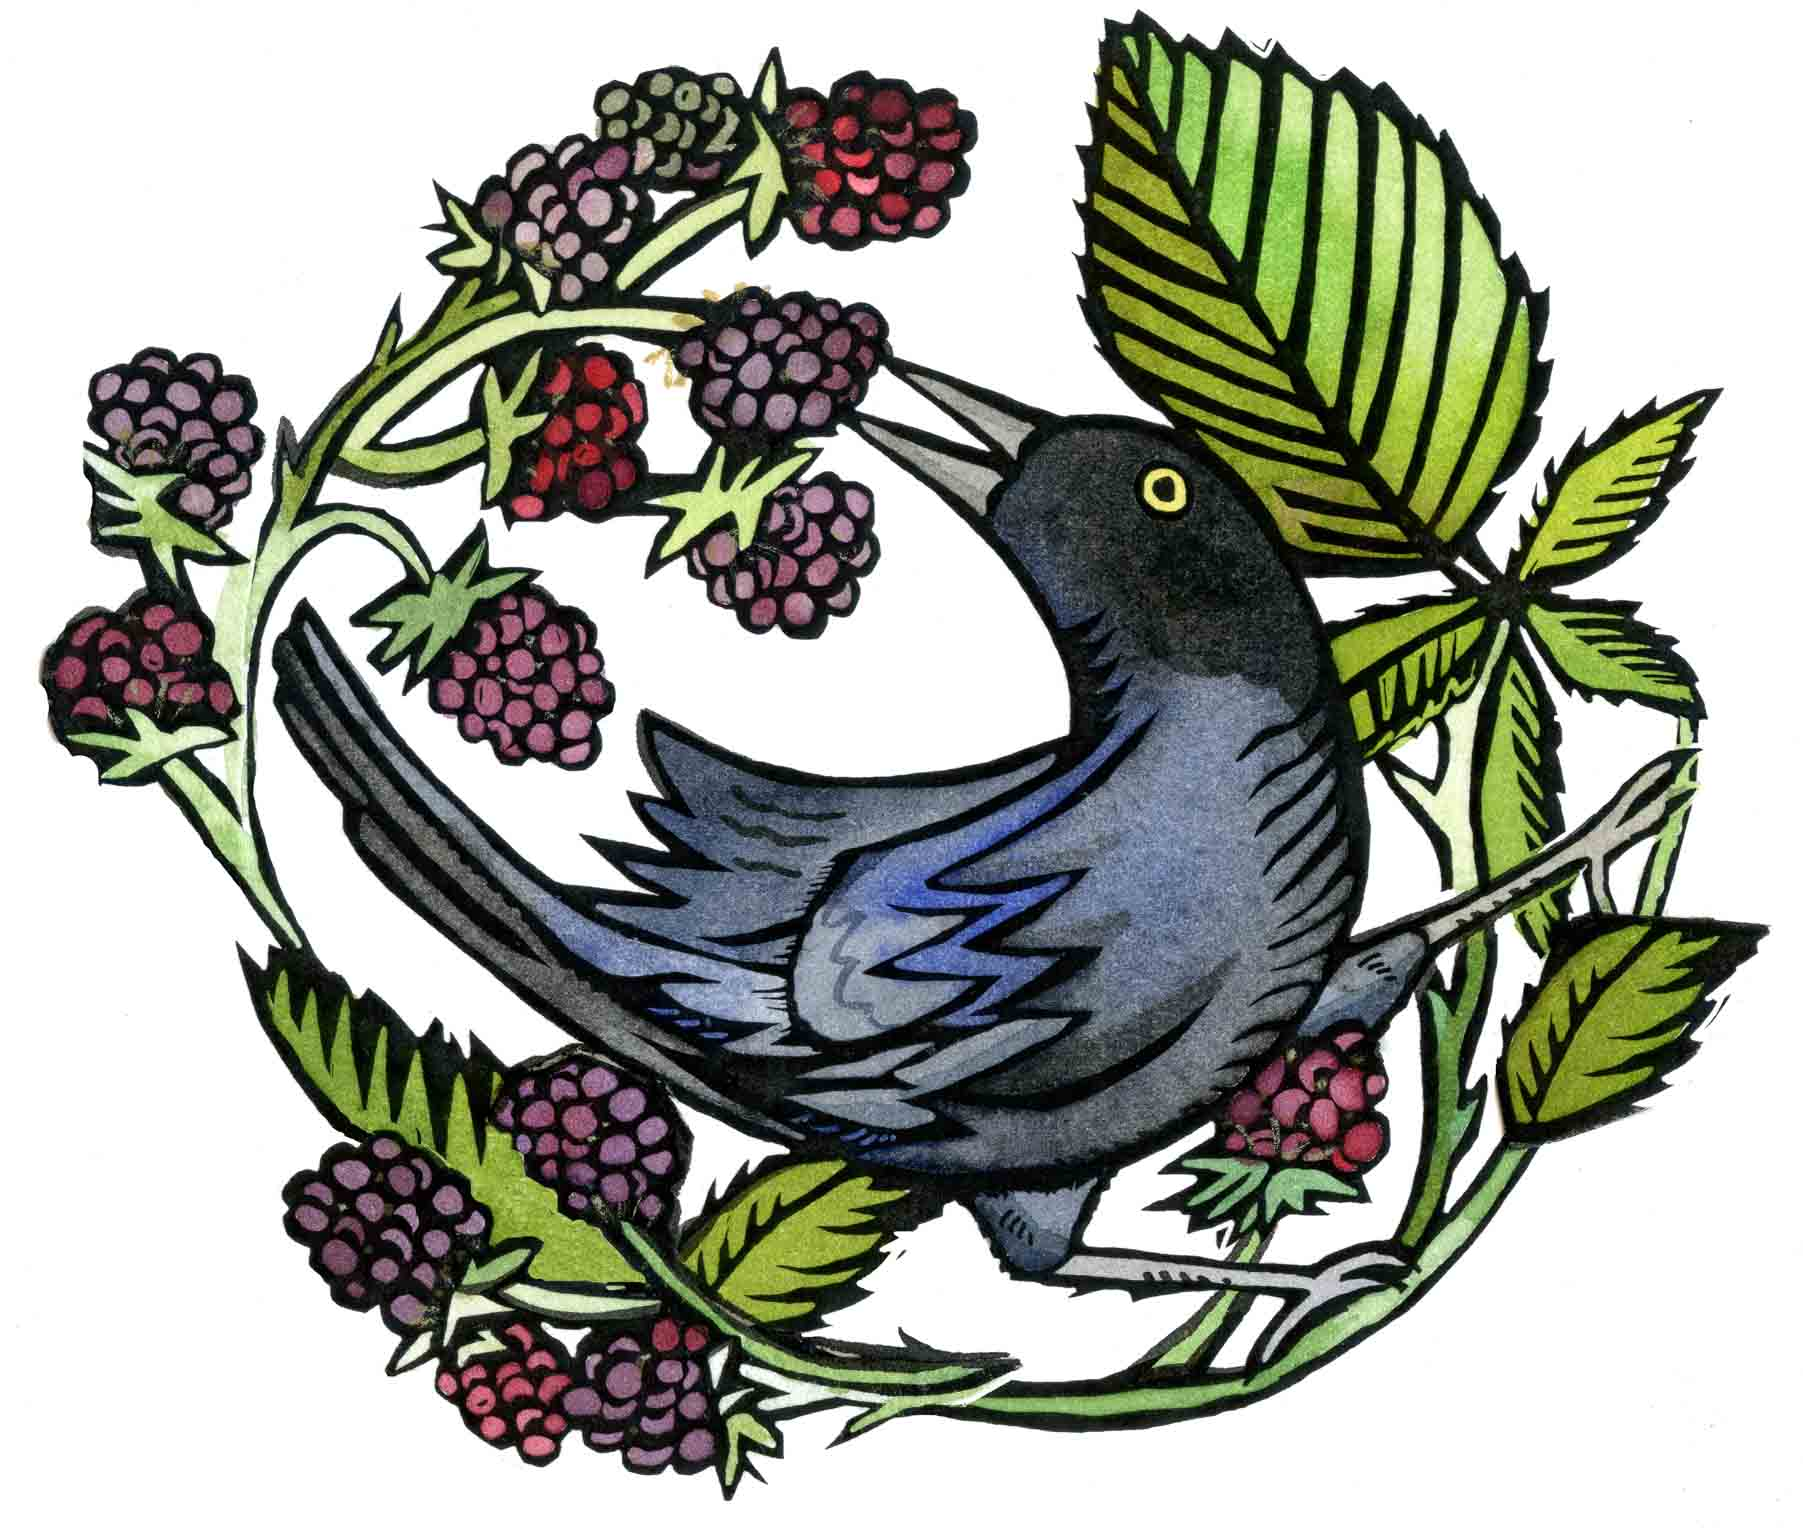 black bird and berries copy.jpg